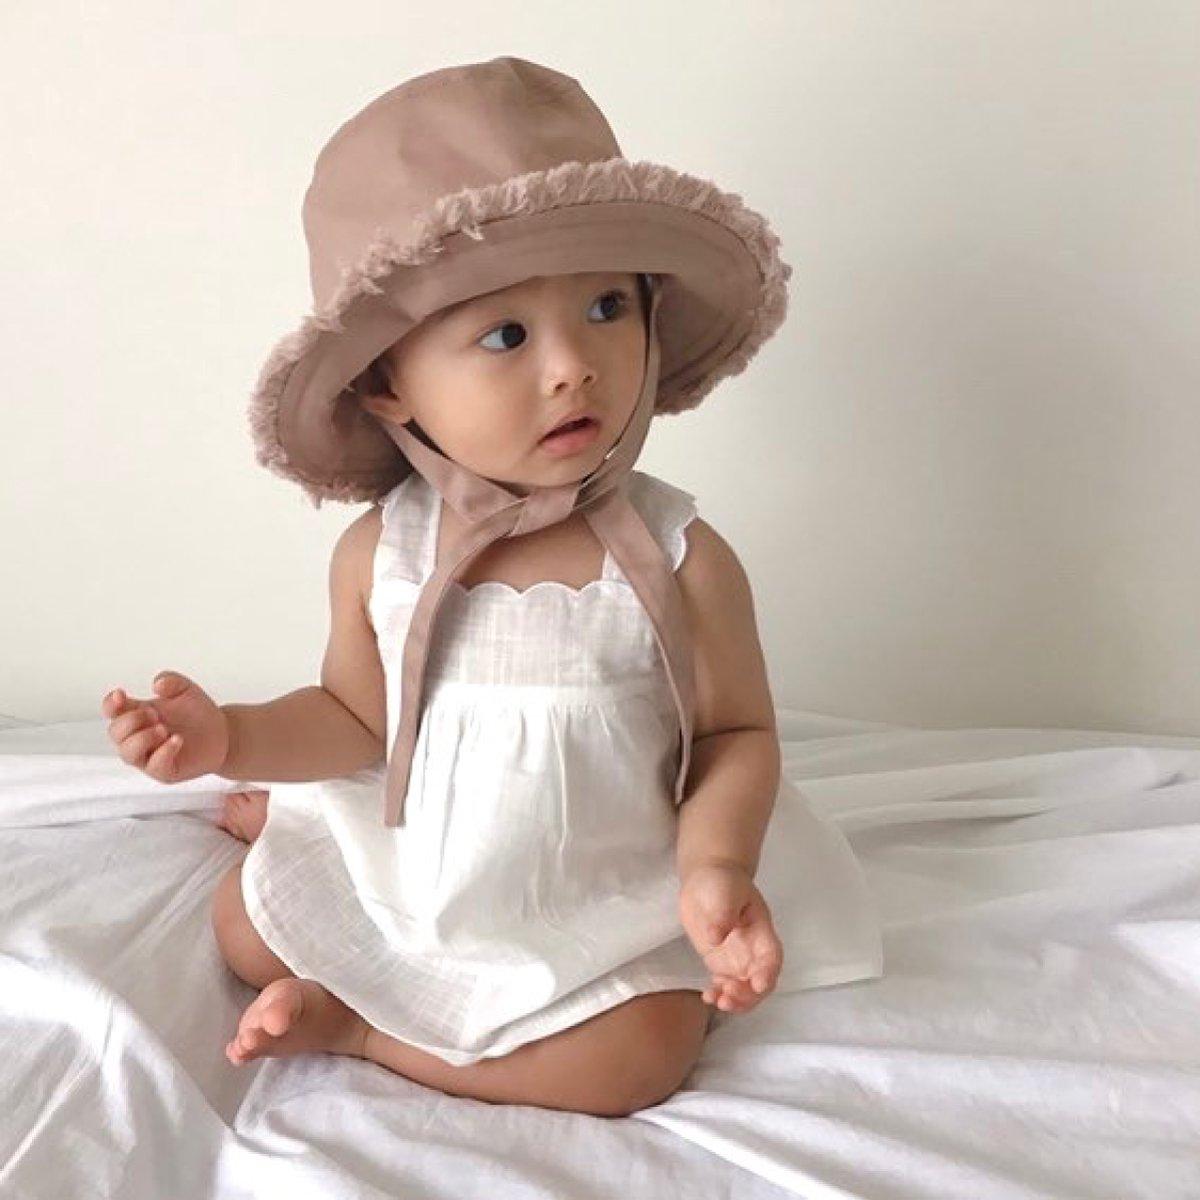 【BABY】Baby Fringe Hat 詳細画像27